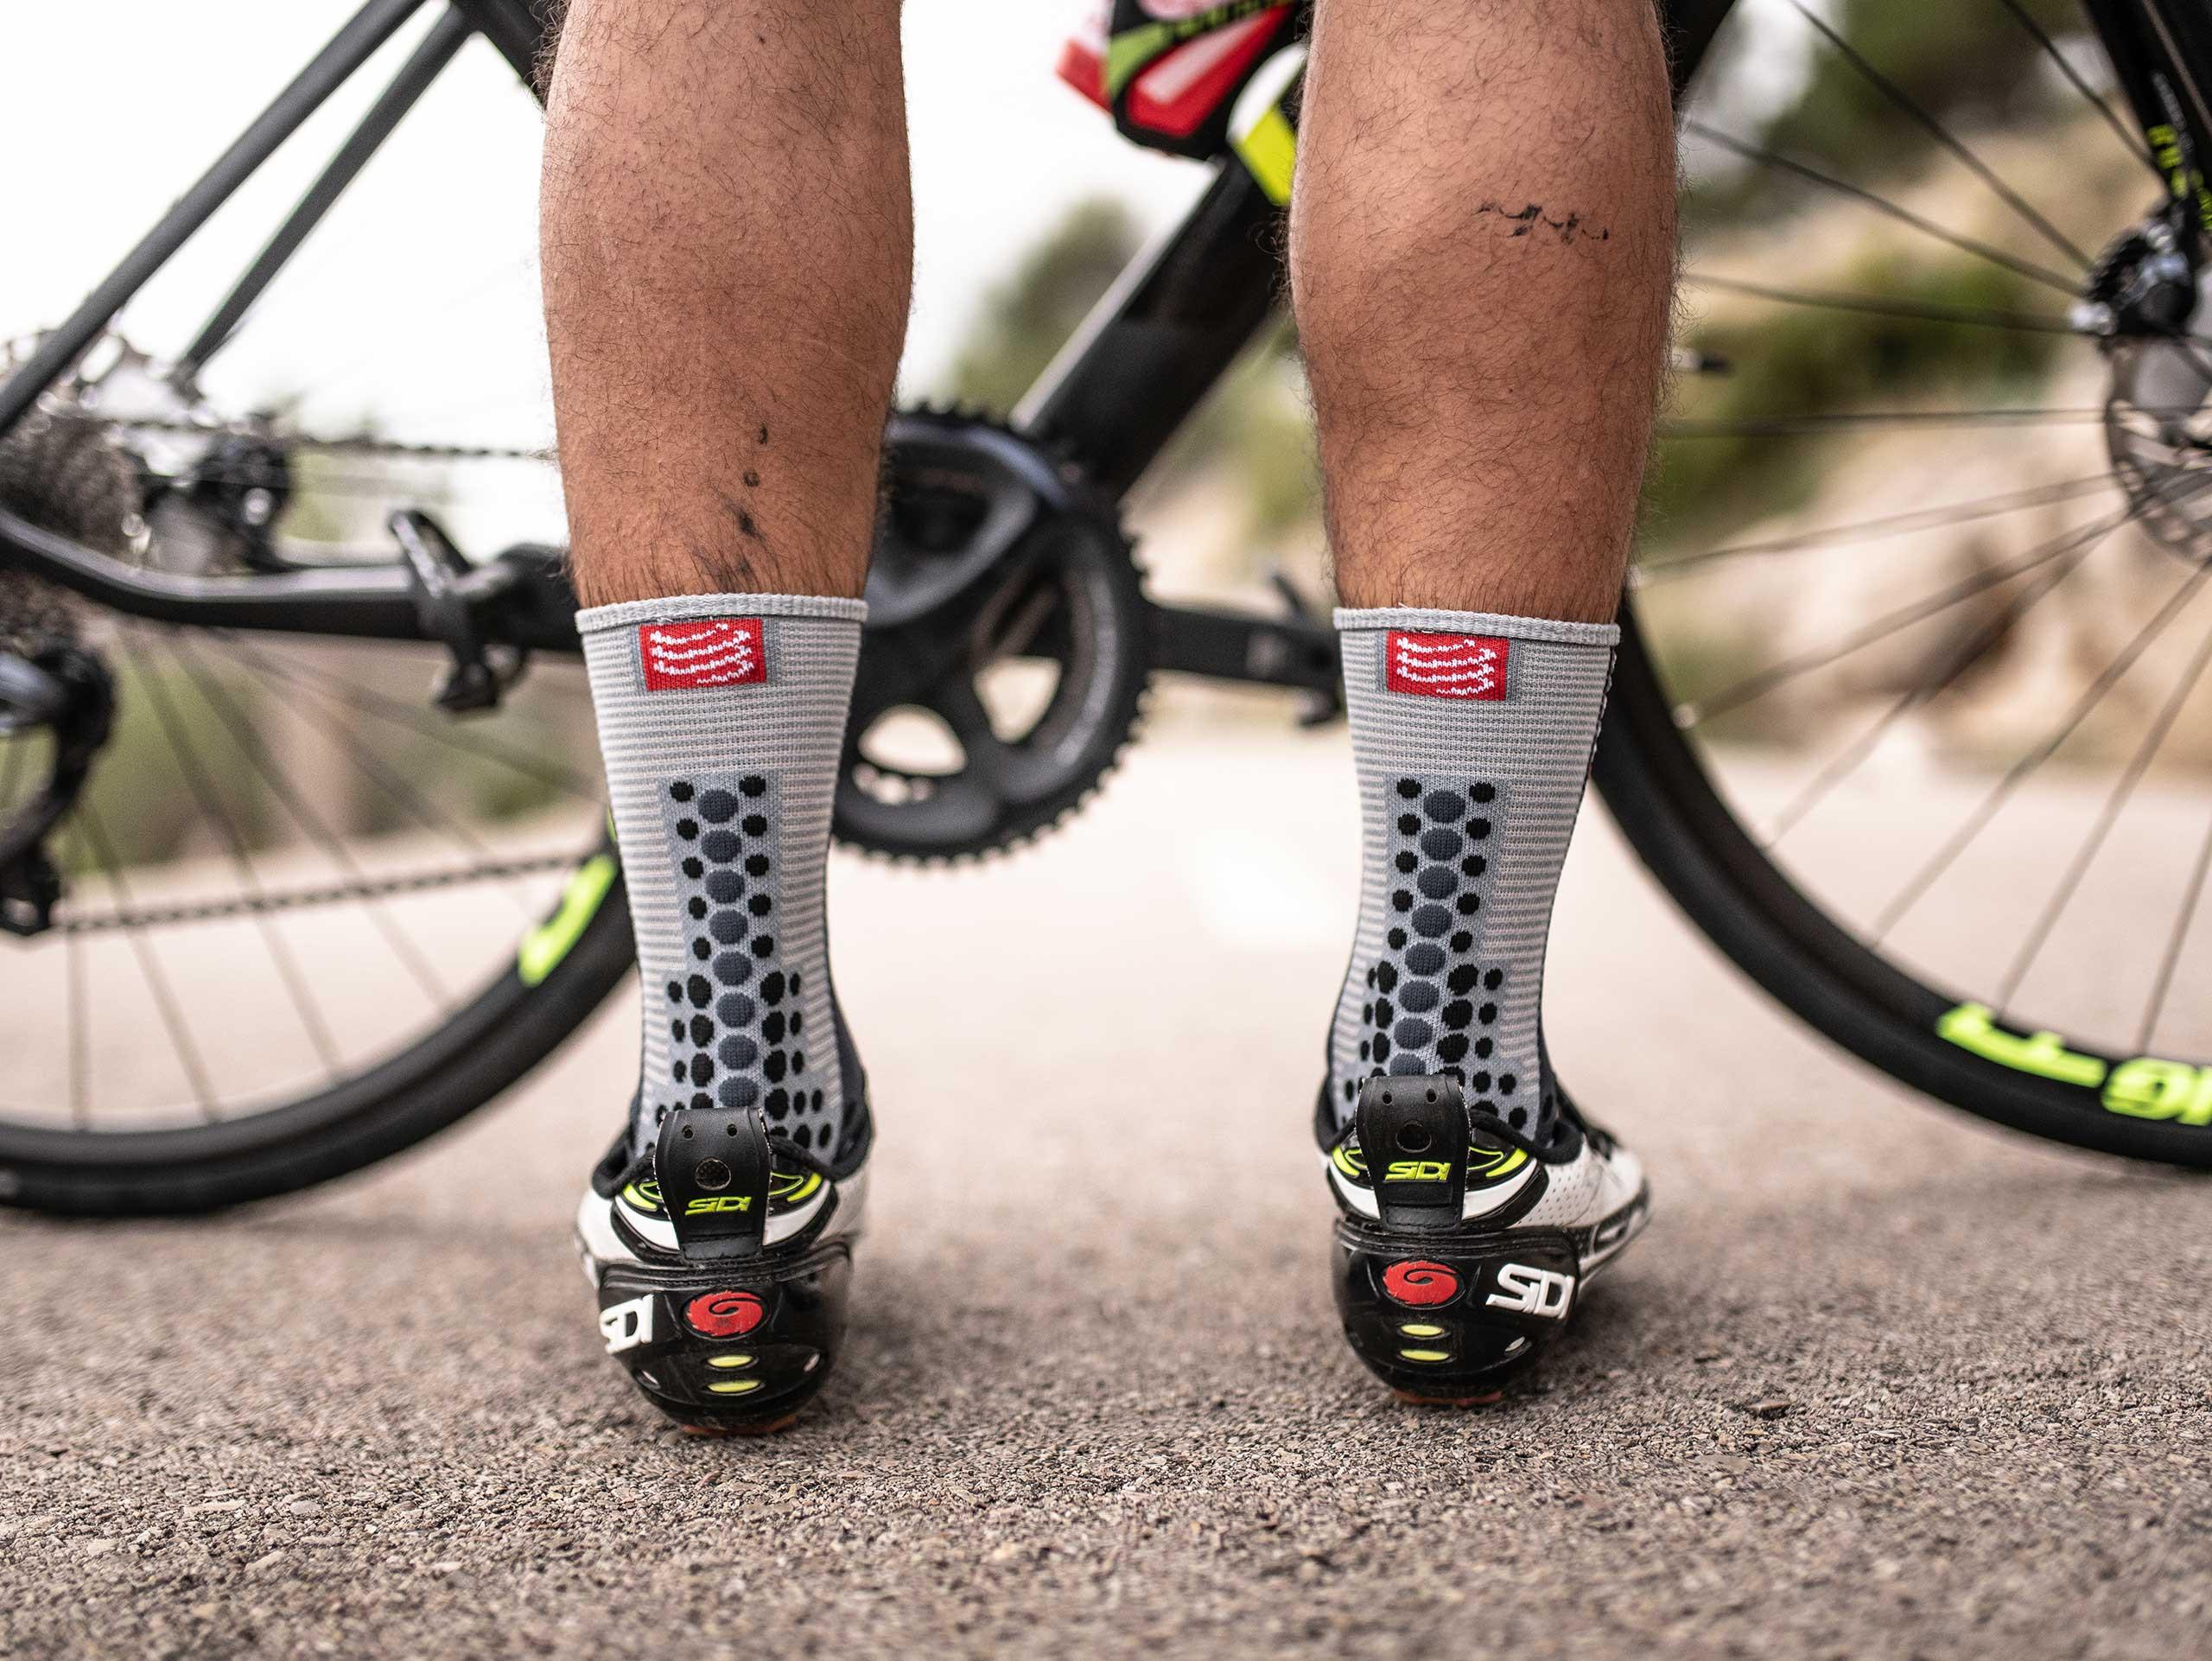 Calze da gara professionali v3.0 Bike grigio melange